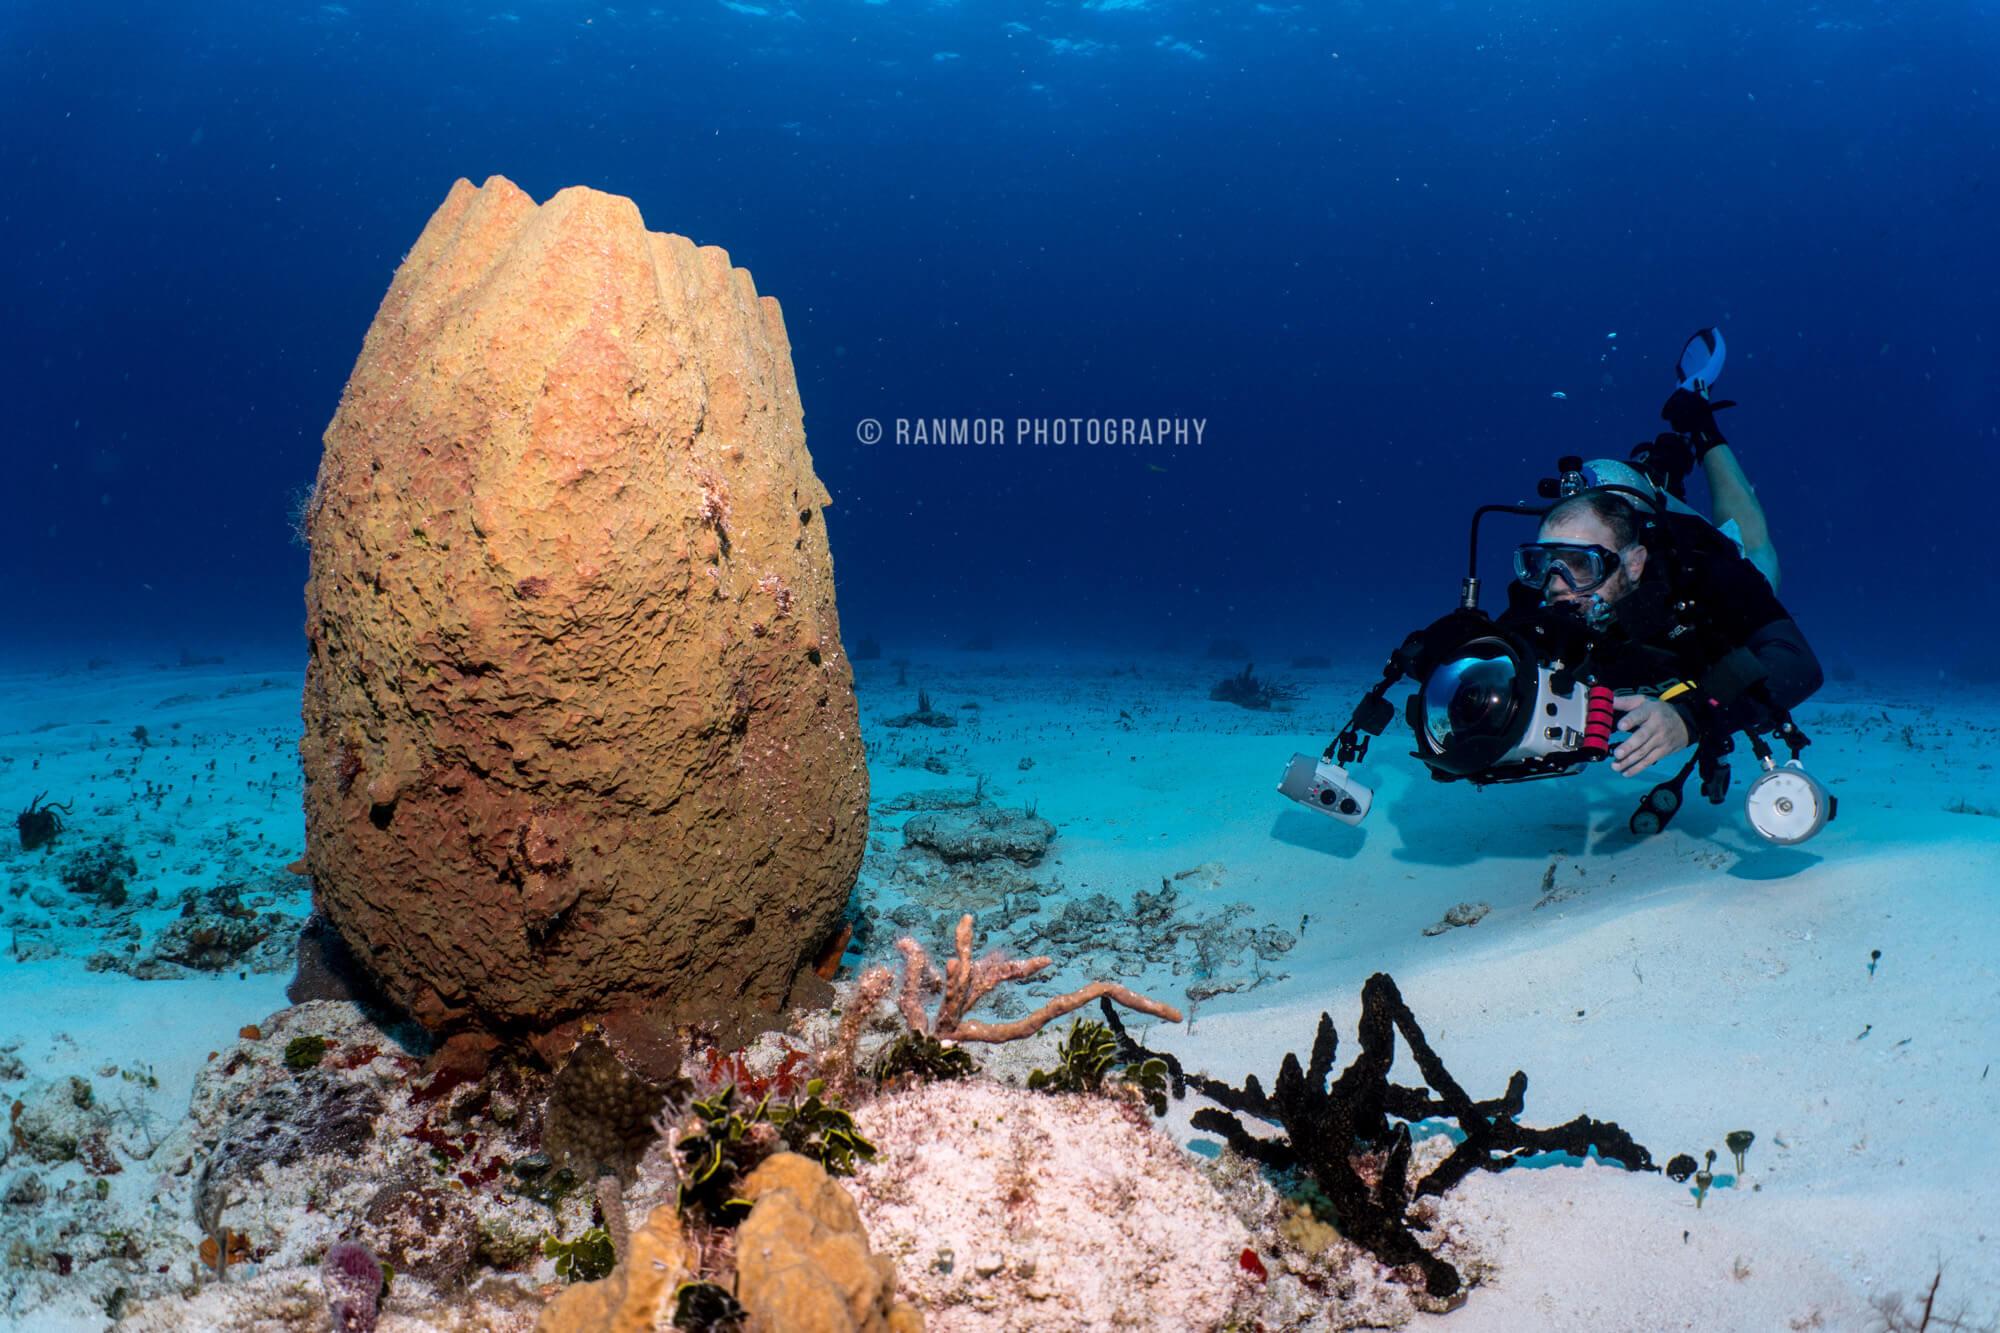 Cozumel My Cozumel Cozumel Underwater Photography School Discount